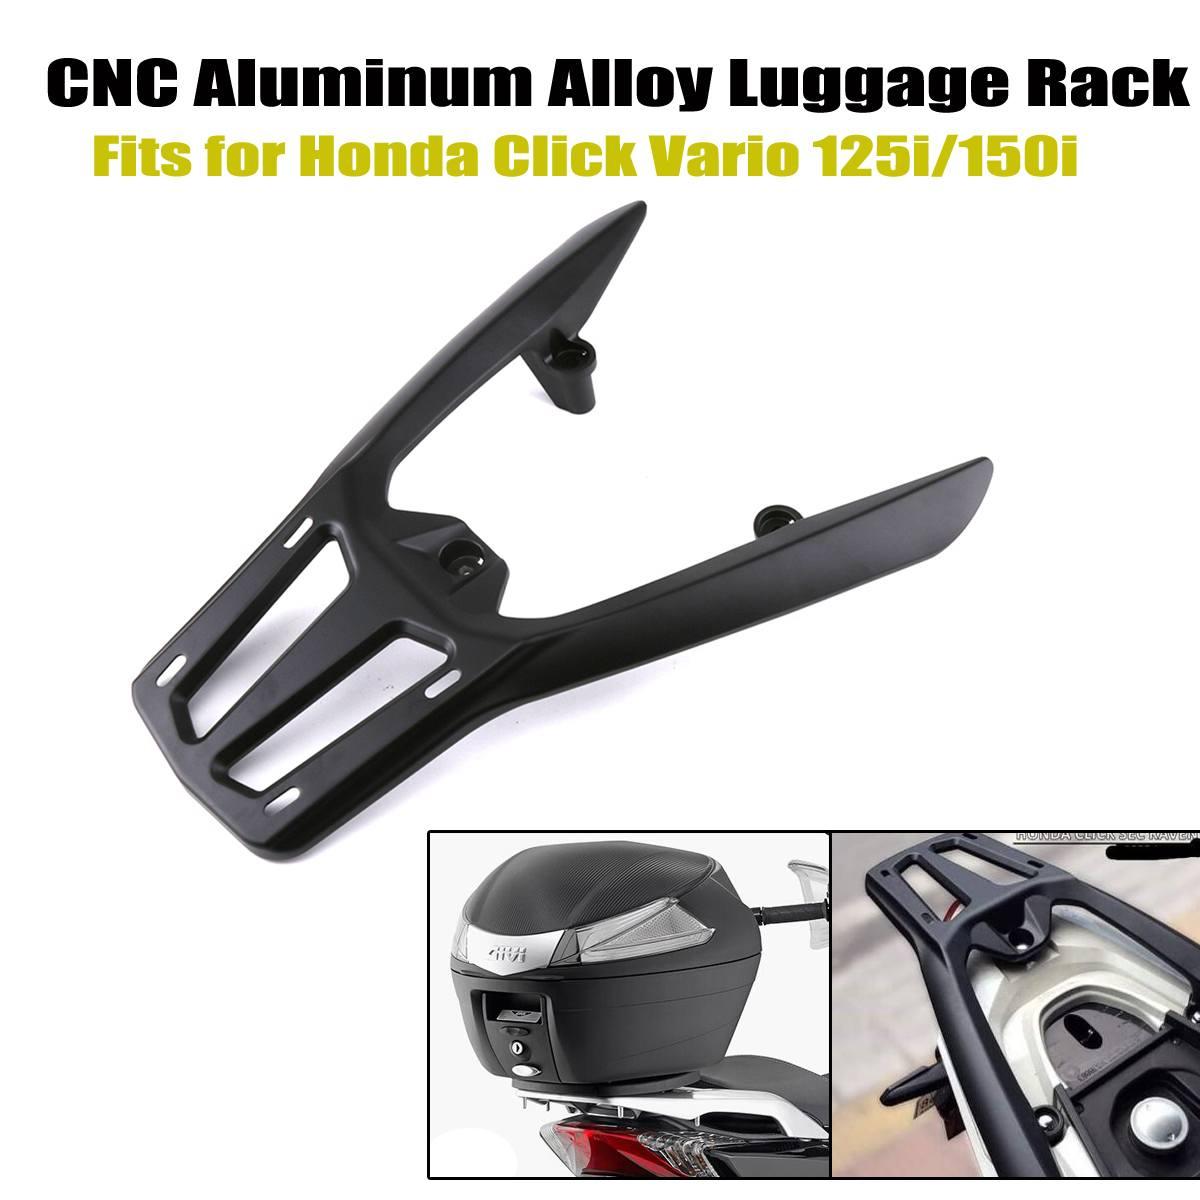 Motorfiets Cnc Aluminium Fiets Achter Bagage Rack Cargo Houder Plank Beugel Kit Voor Honda Klik 125i 150i Vario 125 150